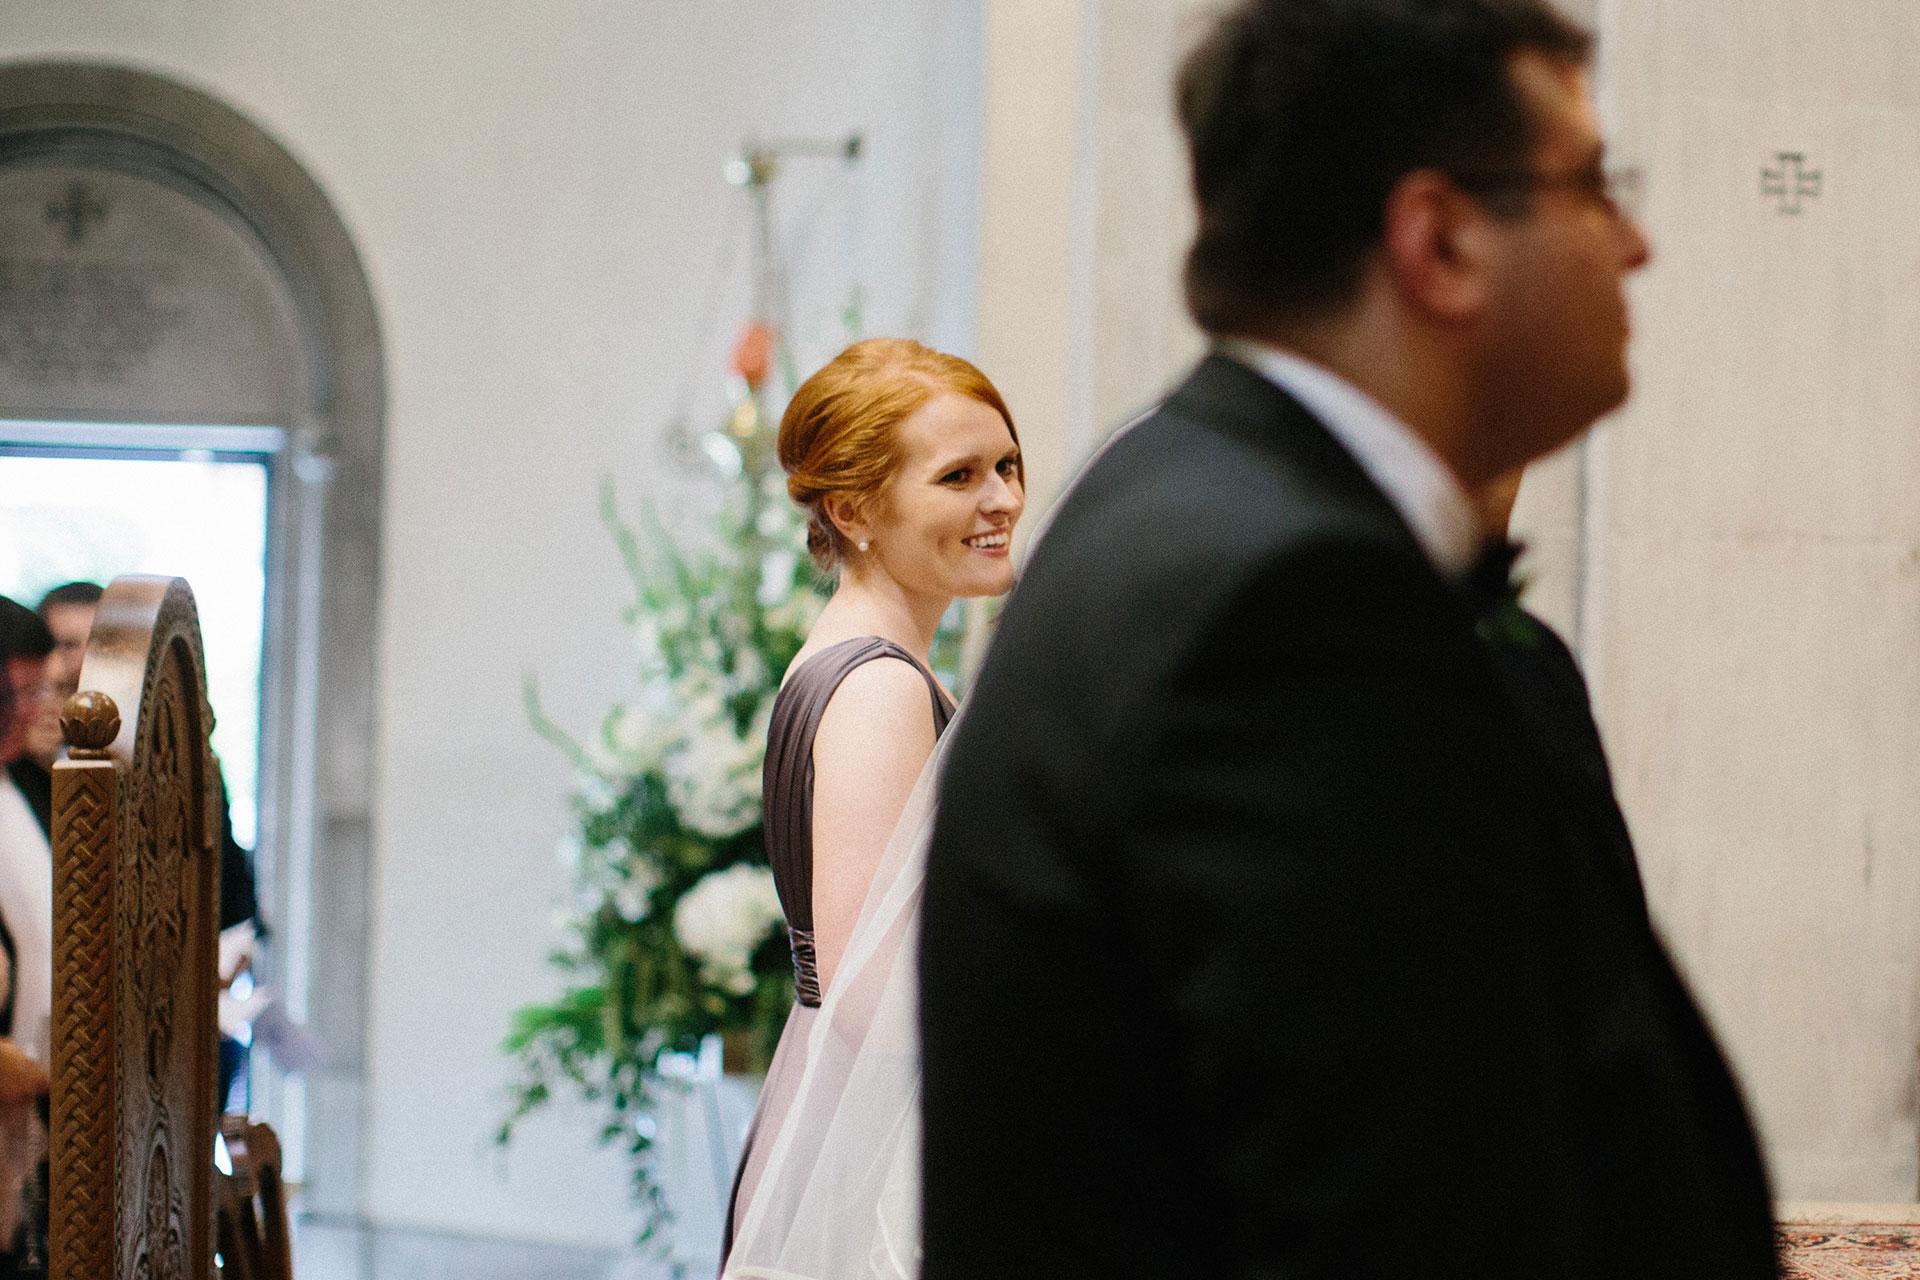 Syon-Park-Wedding-Photographer--_-Michael-Newington-Gray-136.jpg